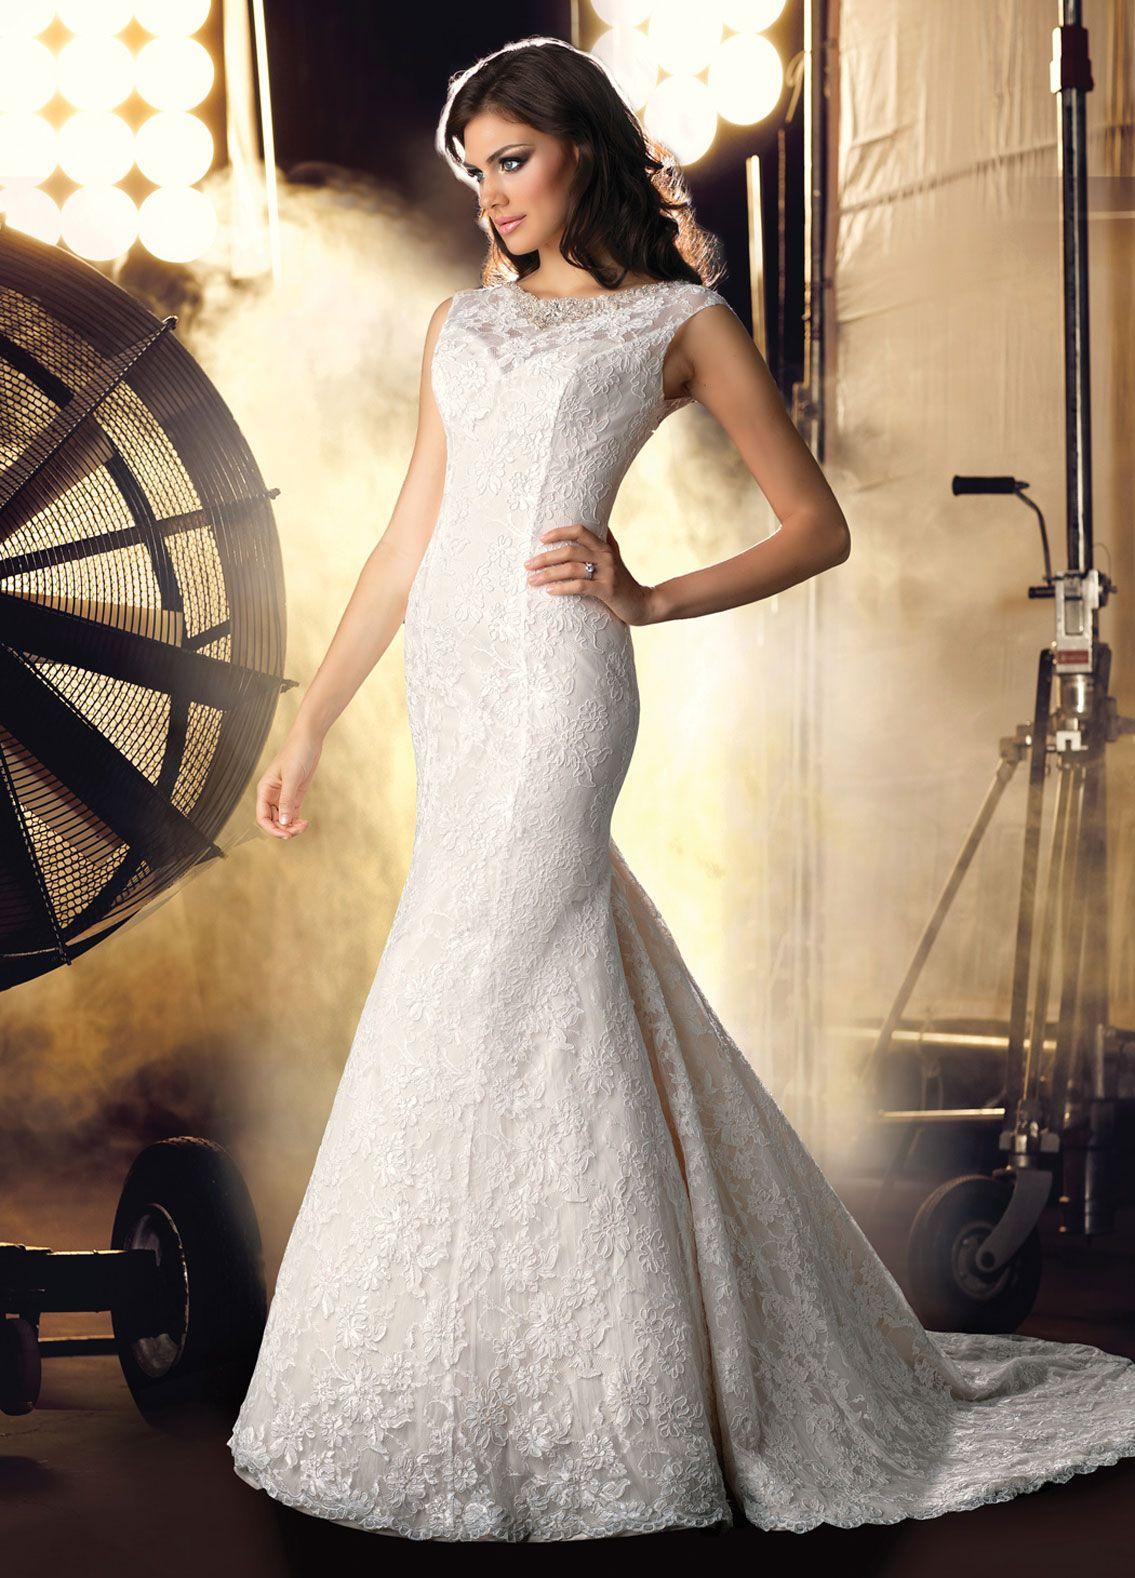 Impression bridal style wedding ideas pinterest wedding